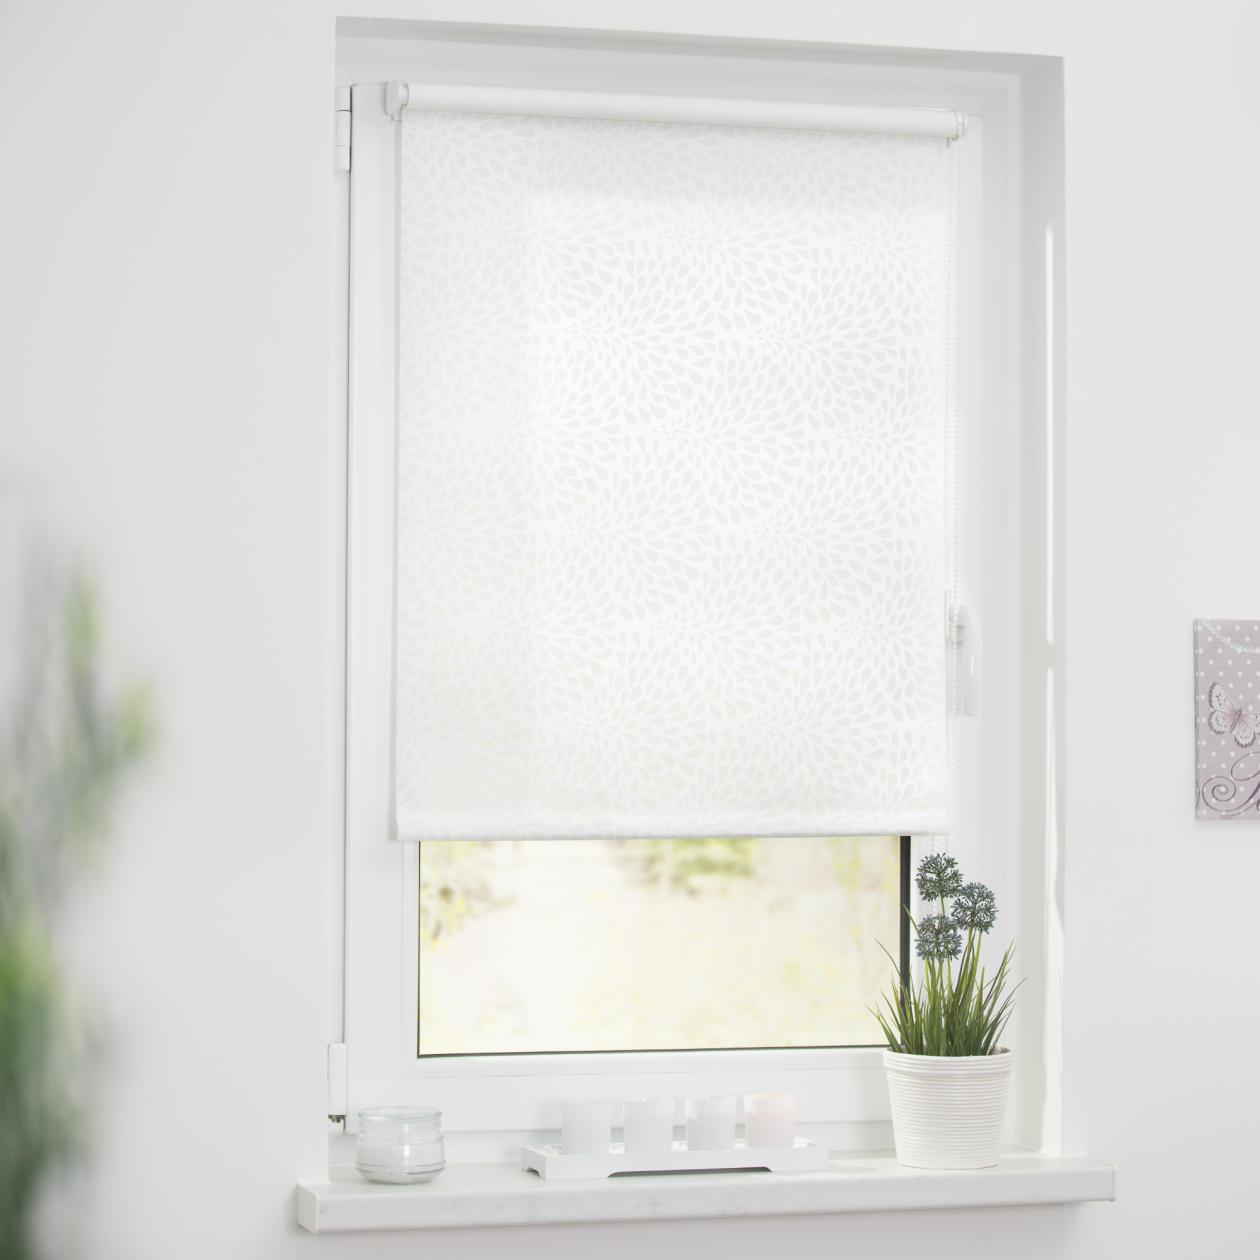 rollo klemmfix ohne bohren blickdicht drops wei transparent lichblick shop. Black Bedroom Furniture Sets. Home Design Ideas